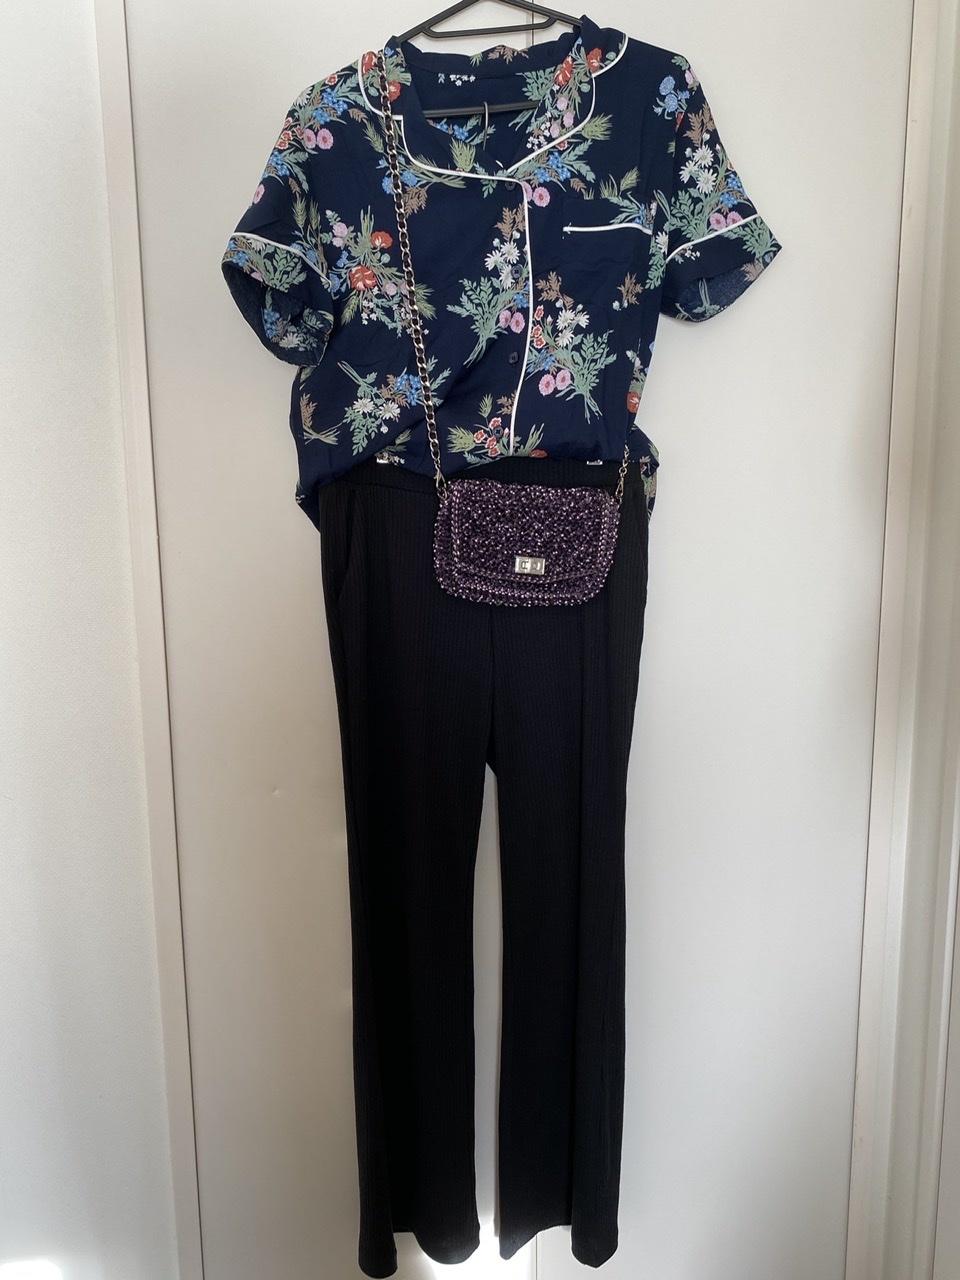 【GU購入品】KEITAMARUYAMAコラボ!パジャマは〇〇!!【#おうち時間】_1_5